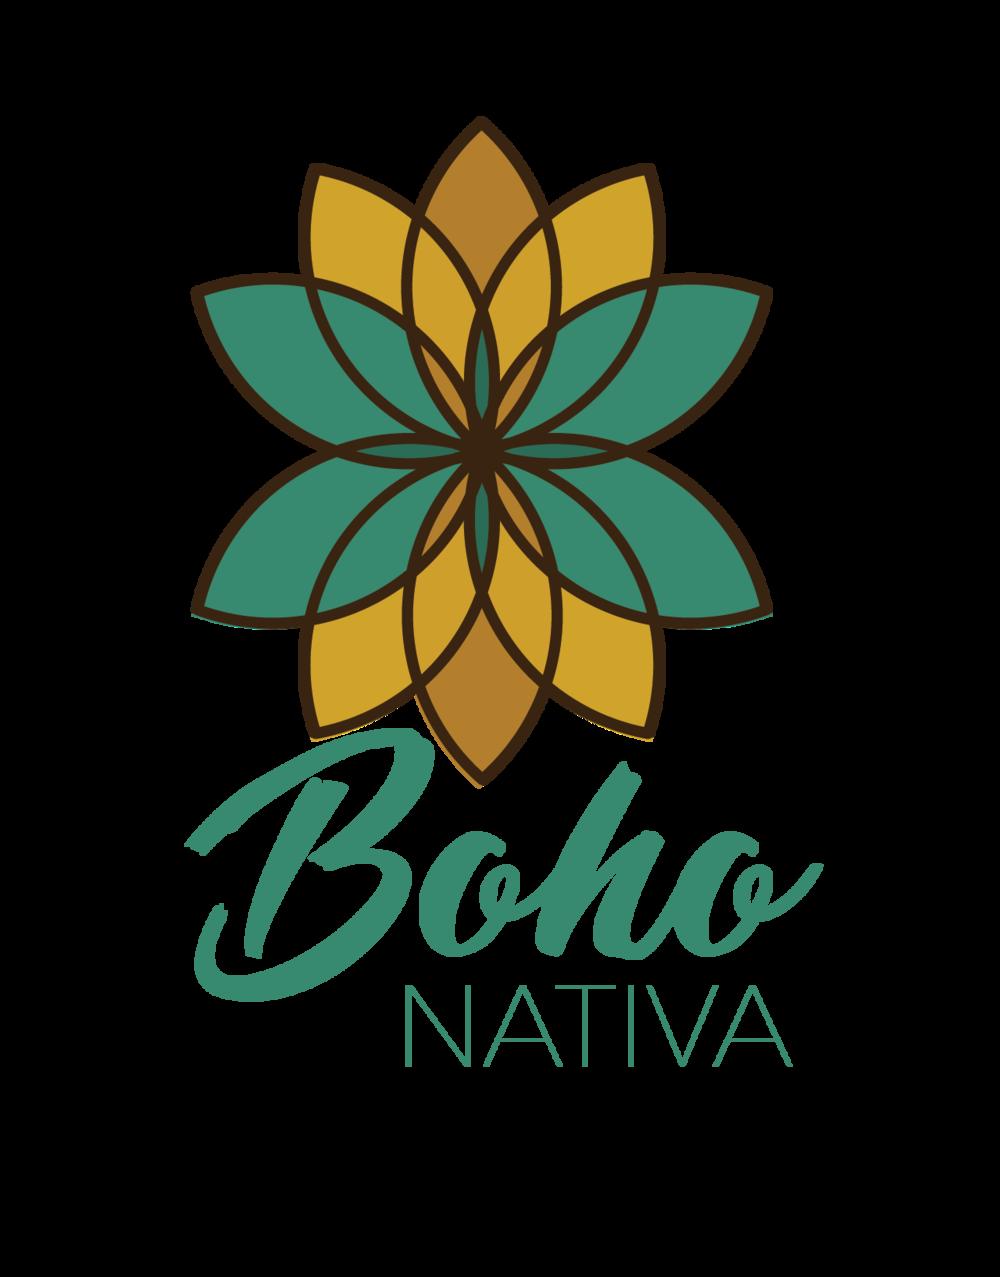 bohonativa-02.png